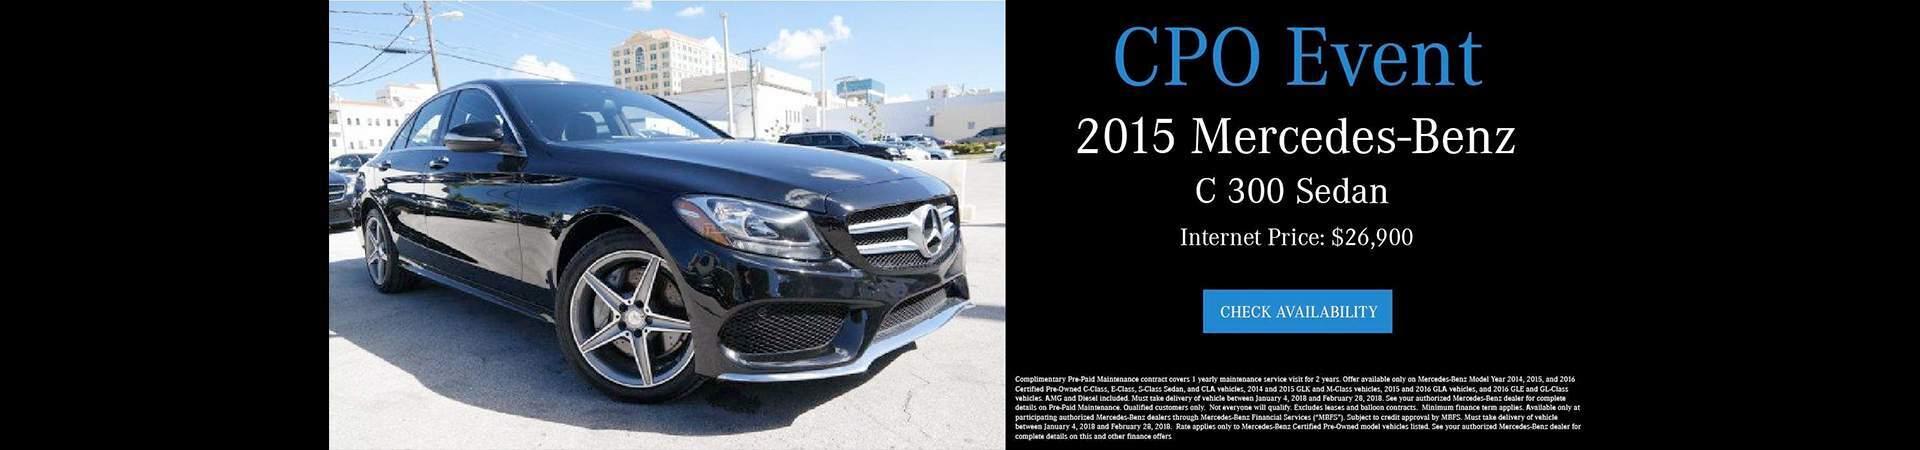 Mercedes benz dealership coral gables fl used cars for Mercedes benz roadside assistance telephone number